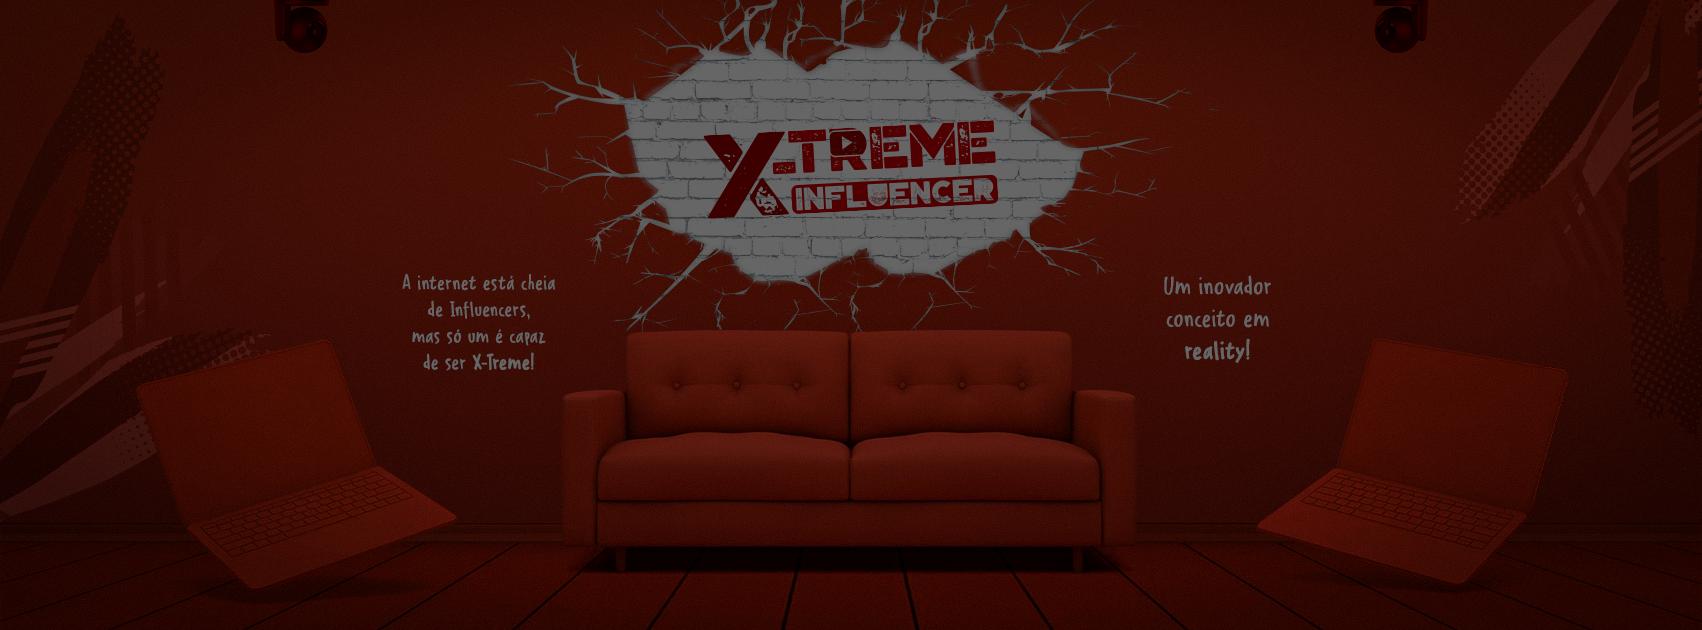 X-treme Influencer